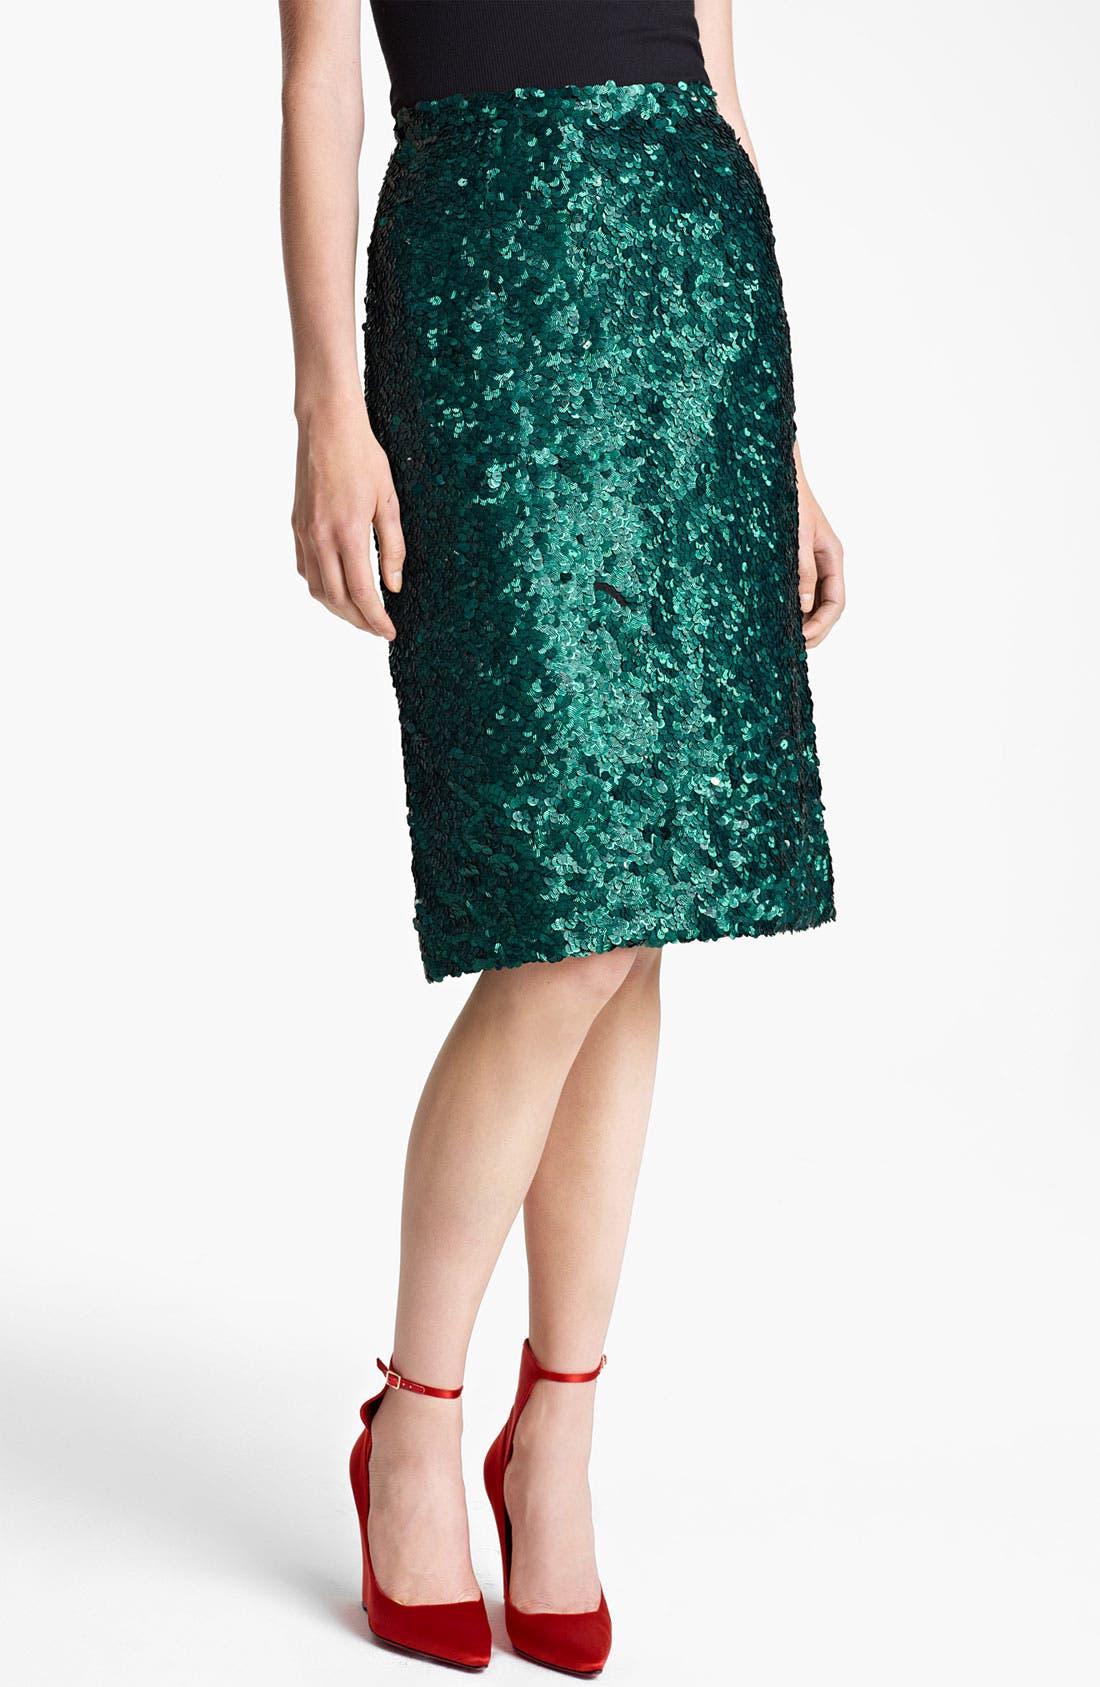 Alternate Image 1 Selected - Burberry Prorsum Sequin Pencil Skirt